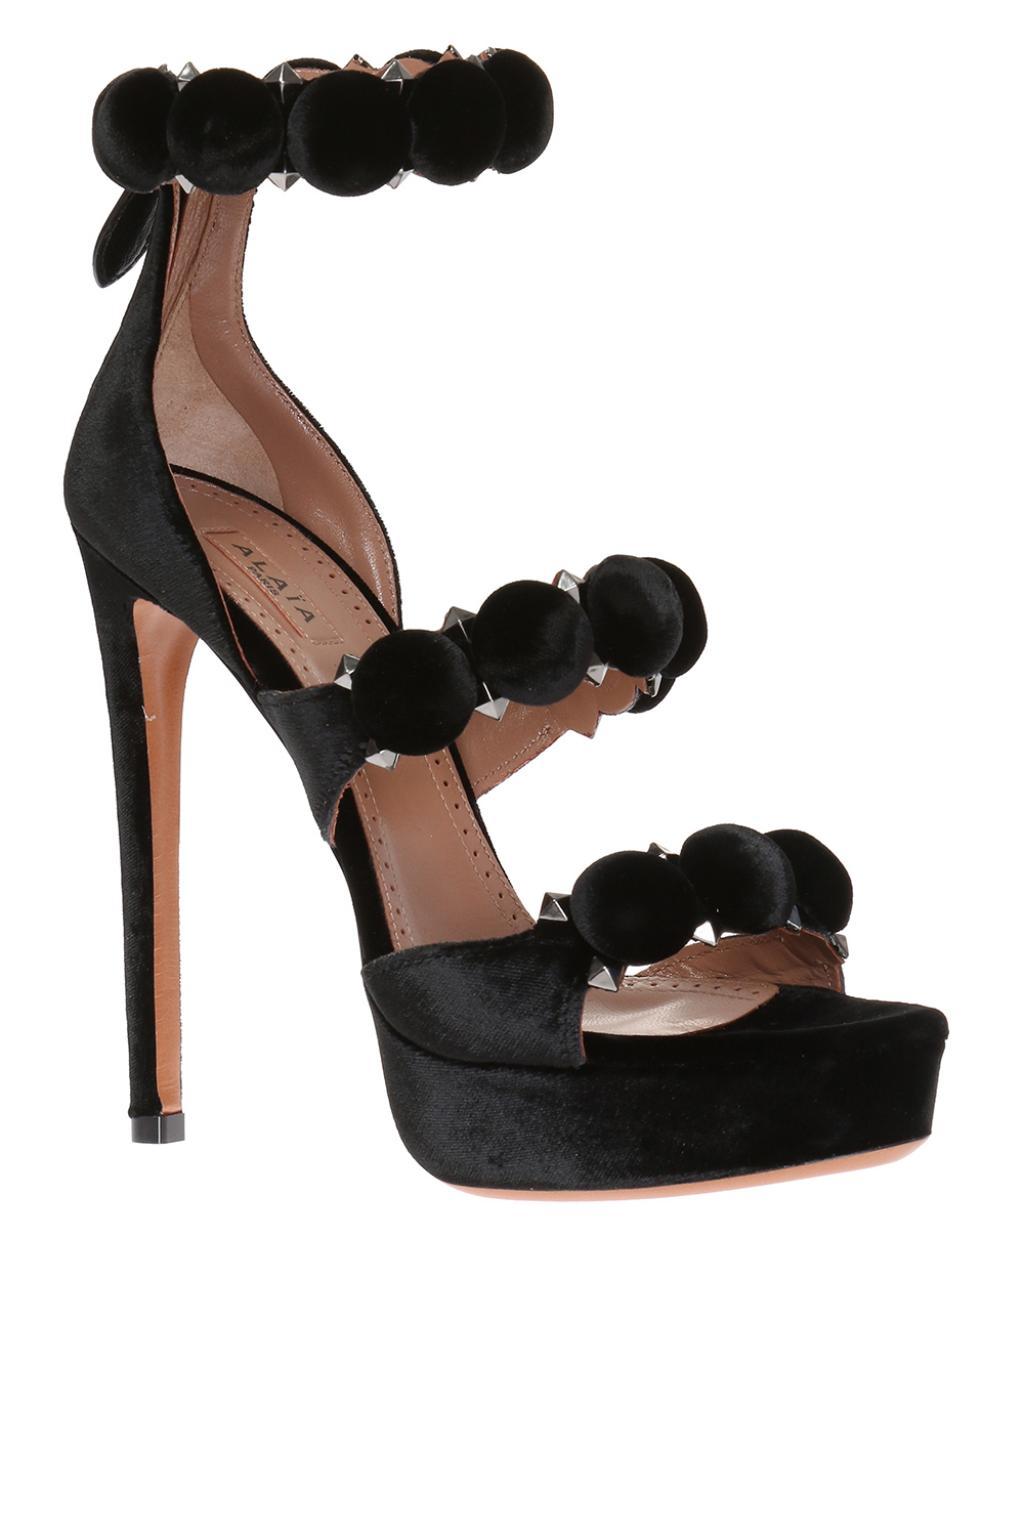 Alaia Velvet platform sandals